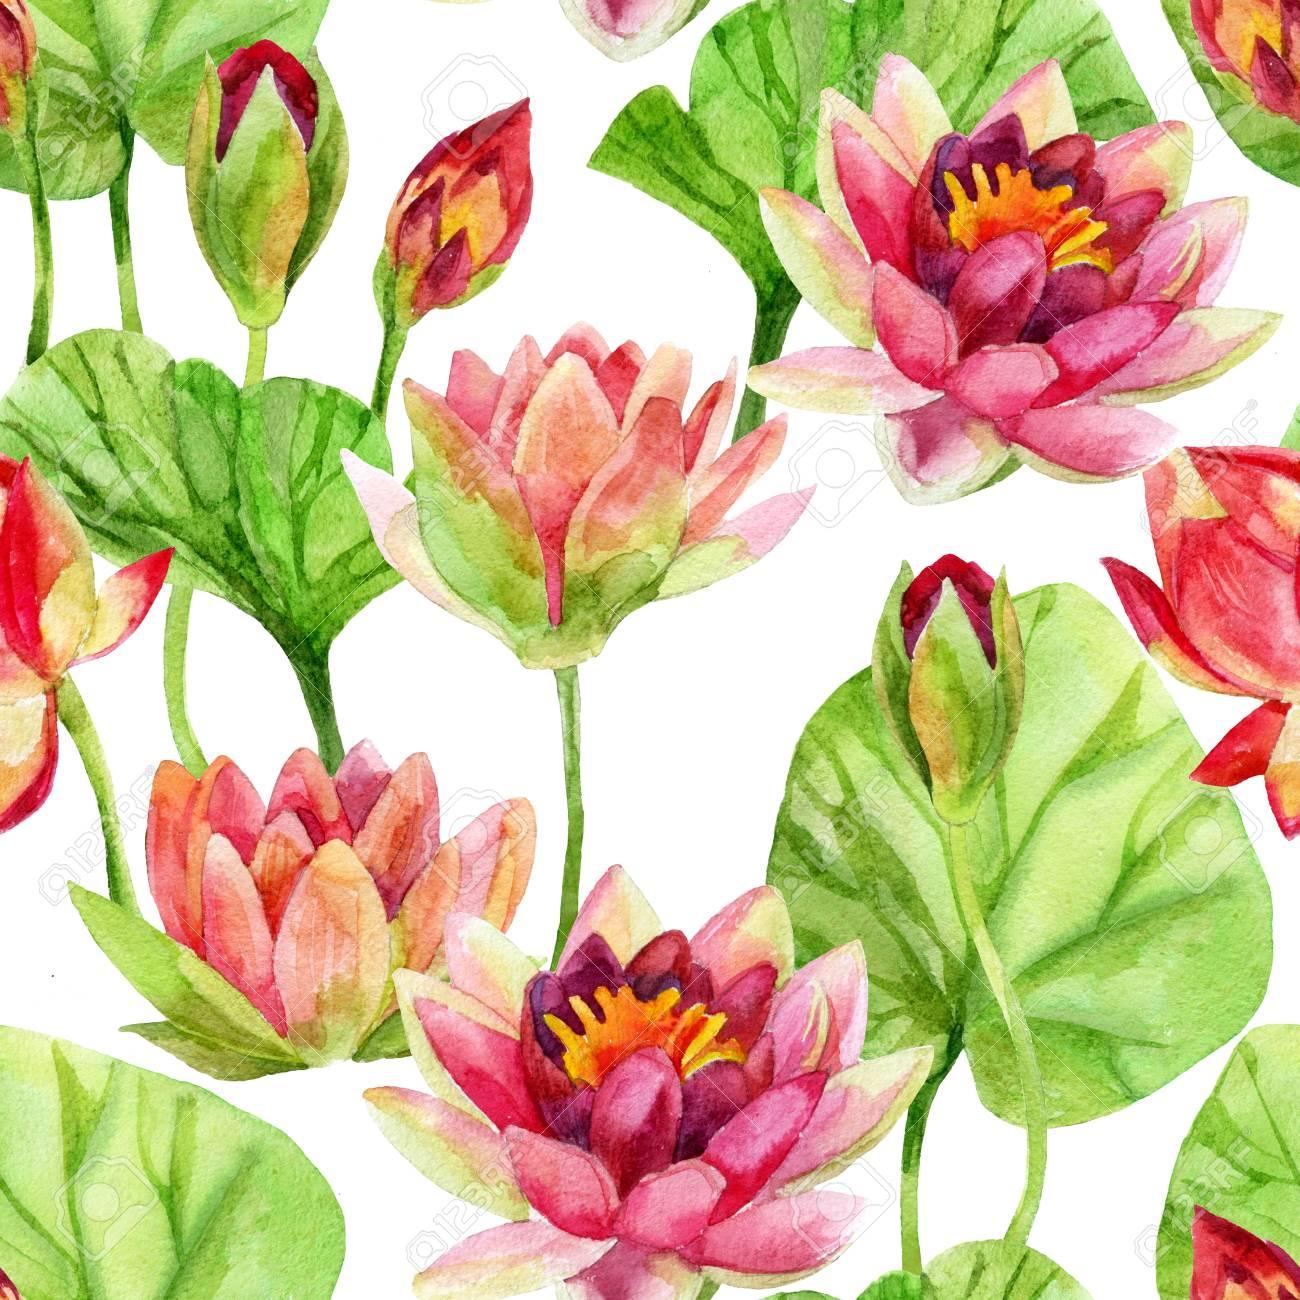 Hand painted lotus flower pattern watercolor illustration stock hand painted lotus flower pattern watercolor illustration stock illustration 76836374 mightylinksfo